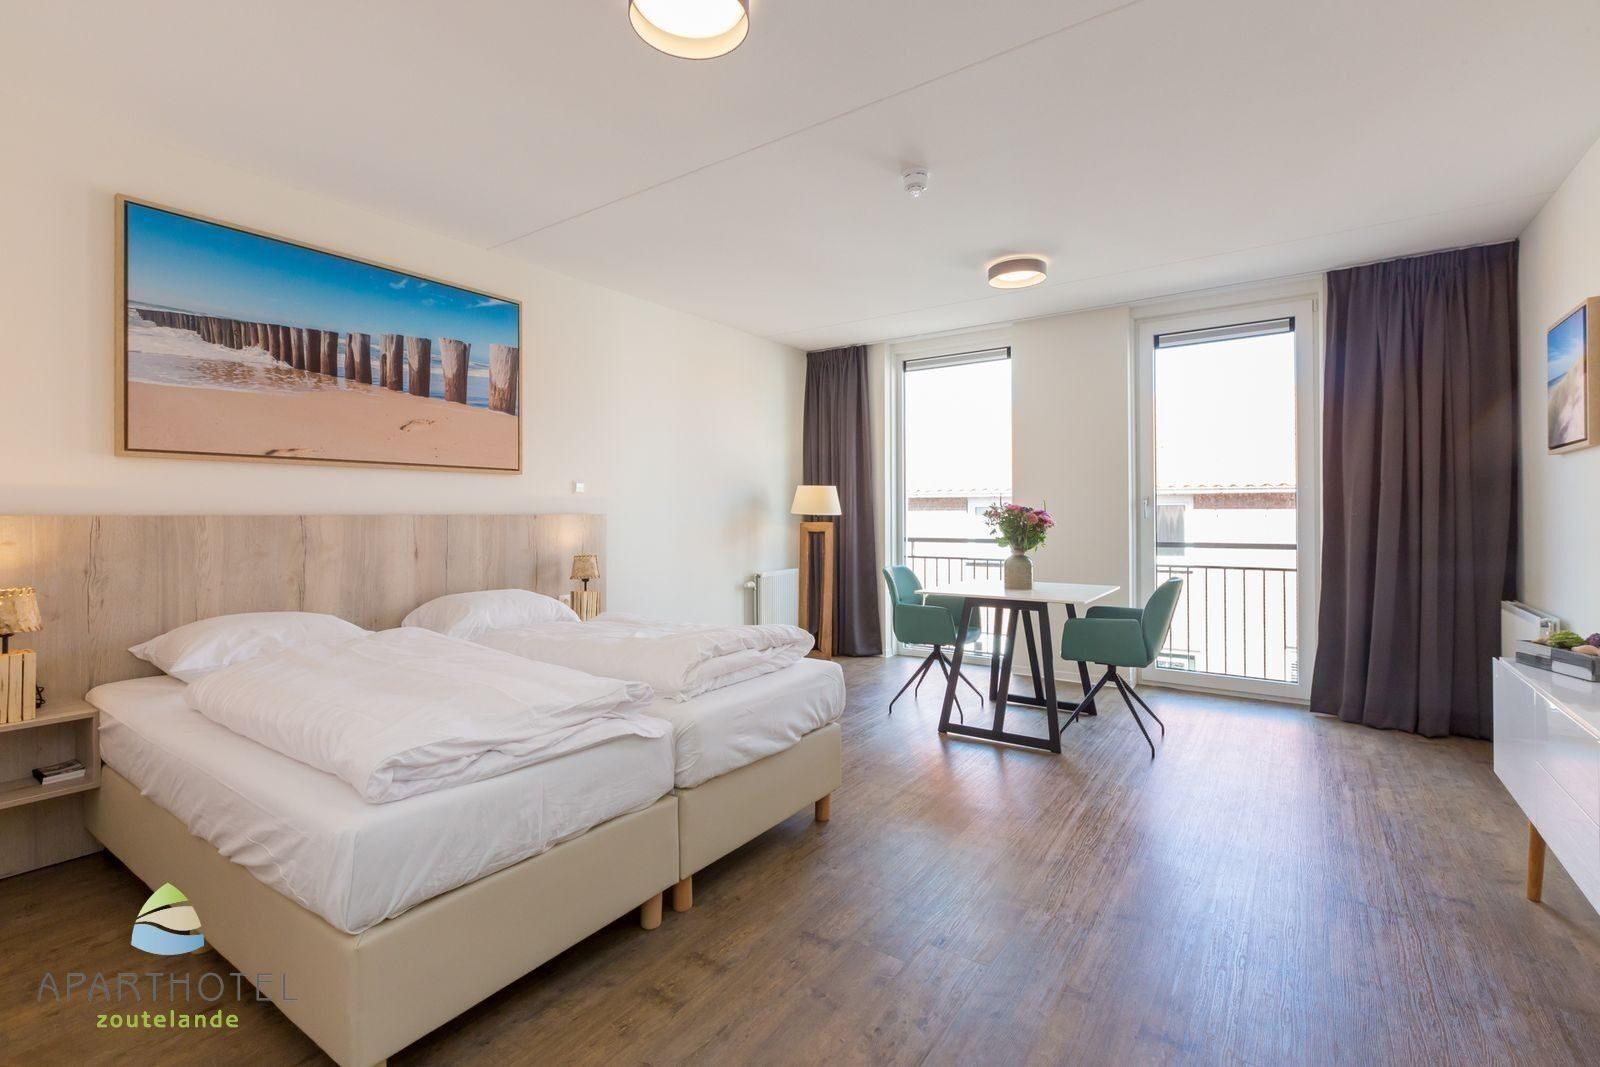 Hotels Zoutelande